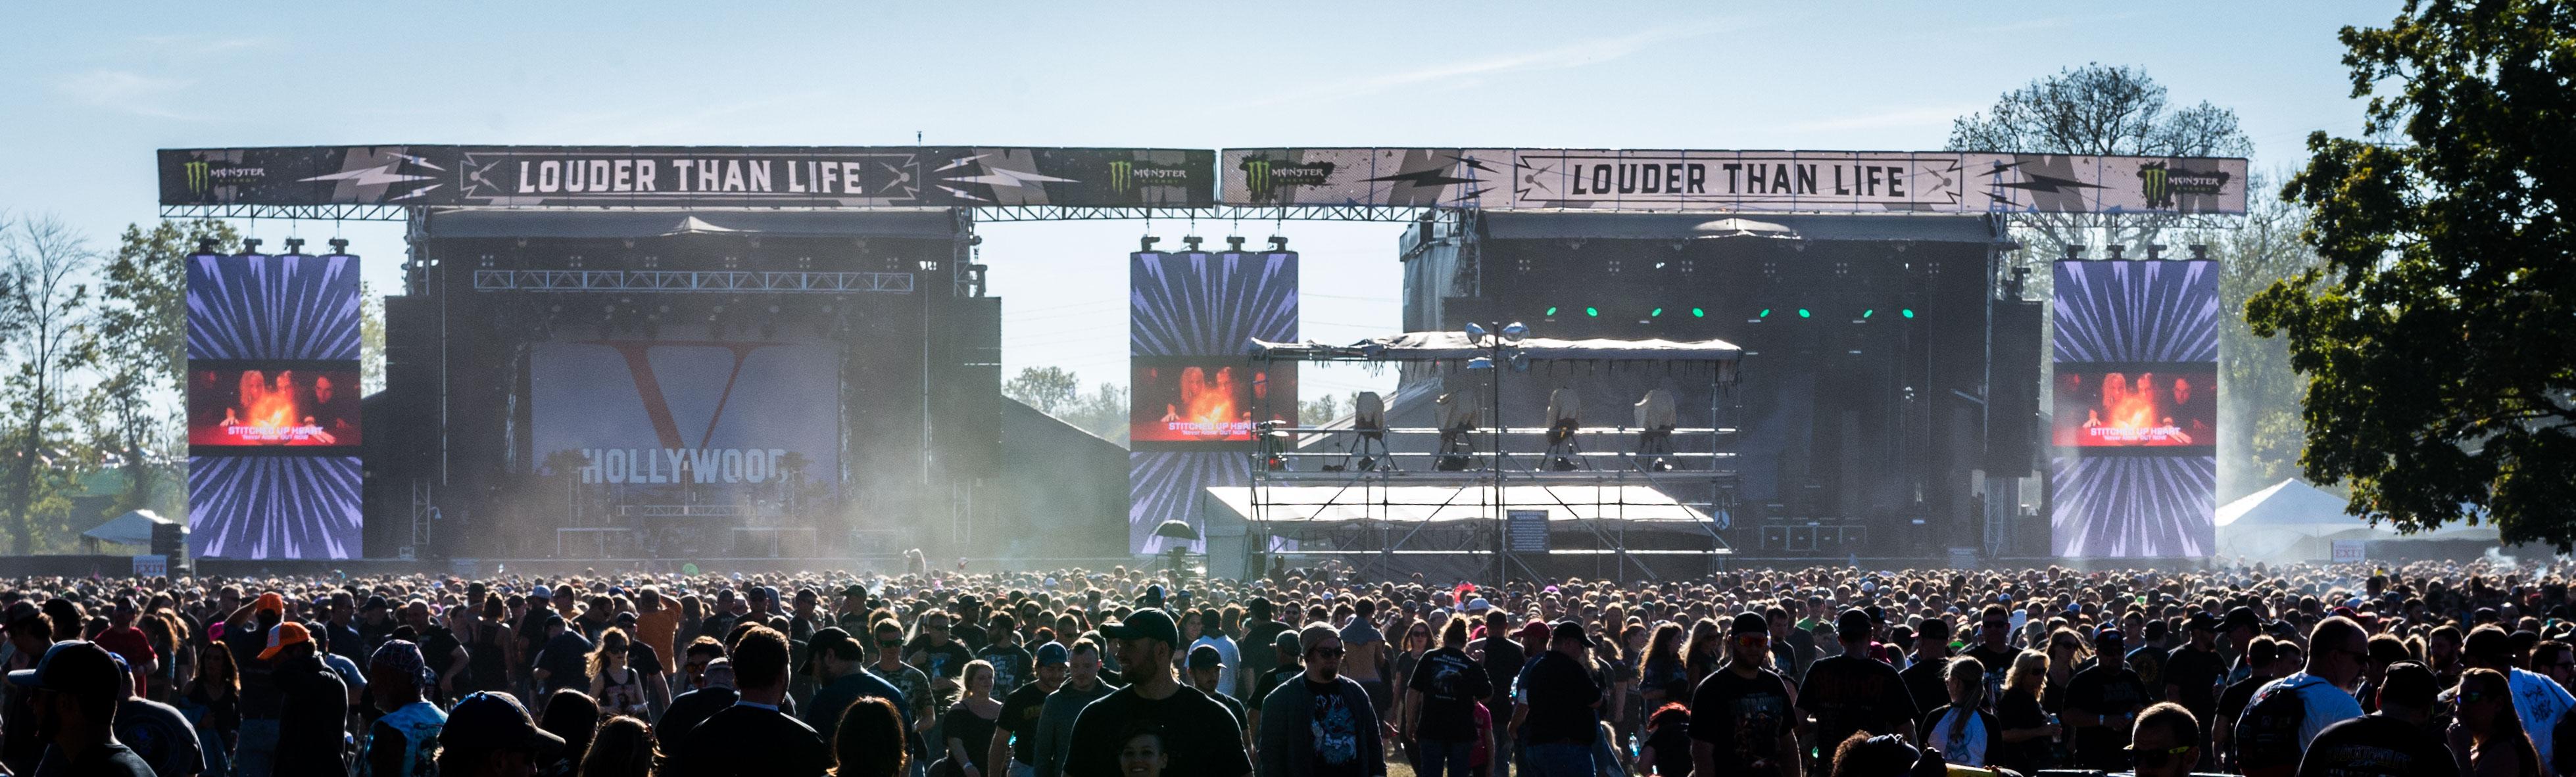 Louder Than Life Festival Sep 30 2017-16-3